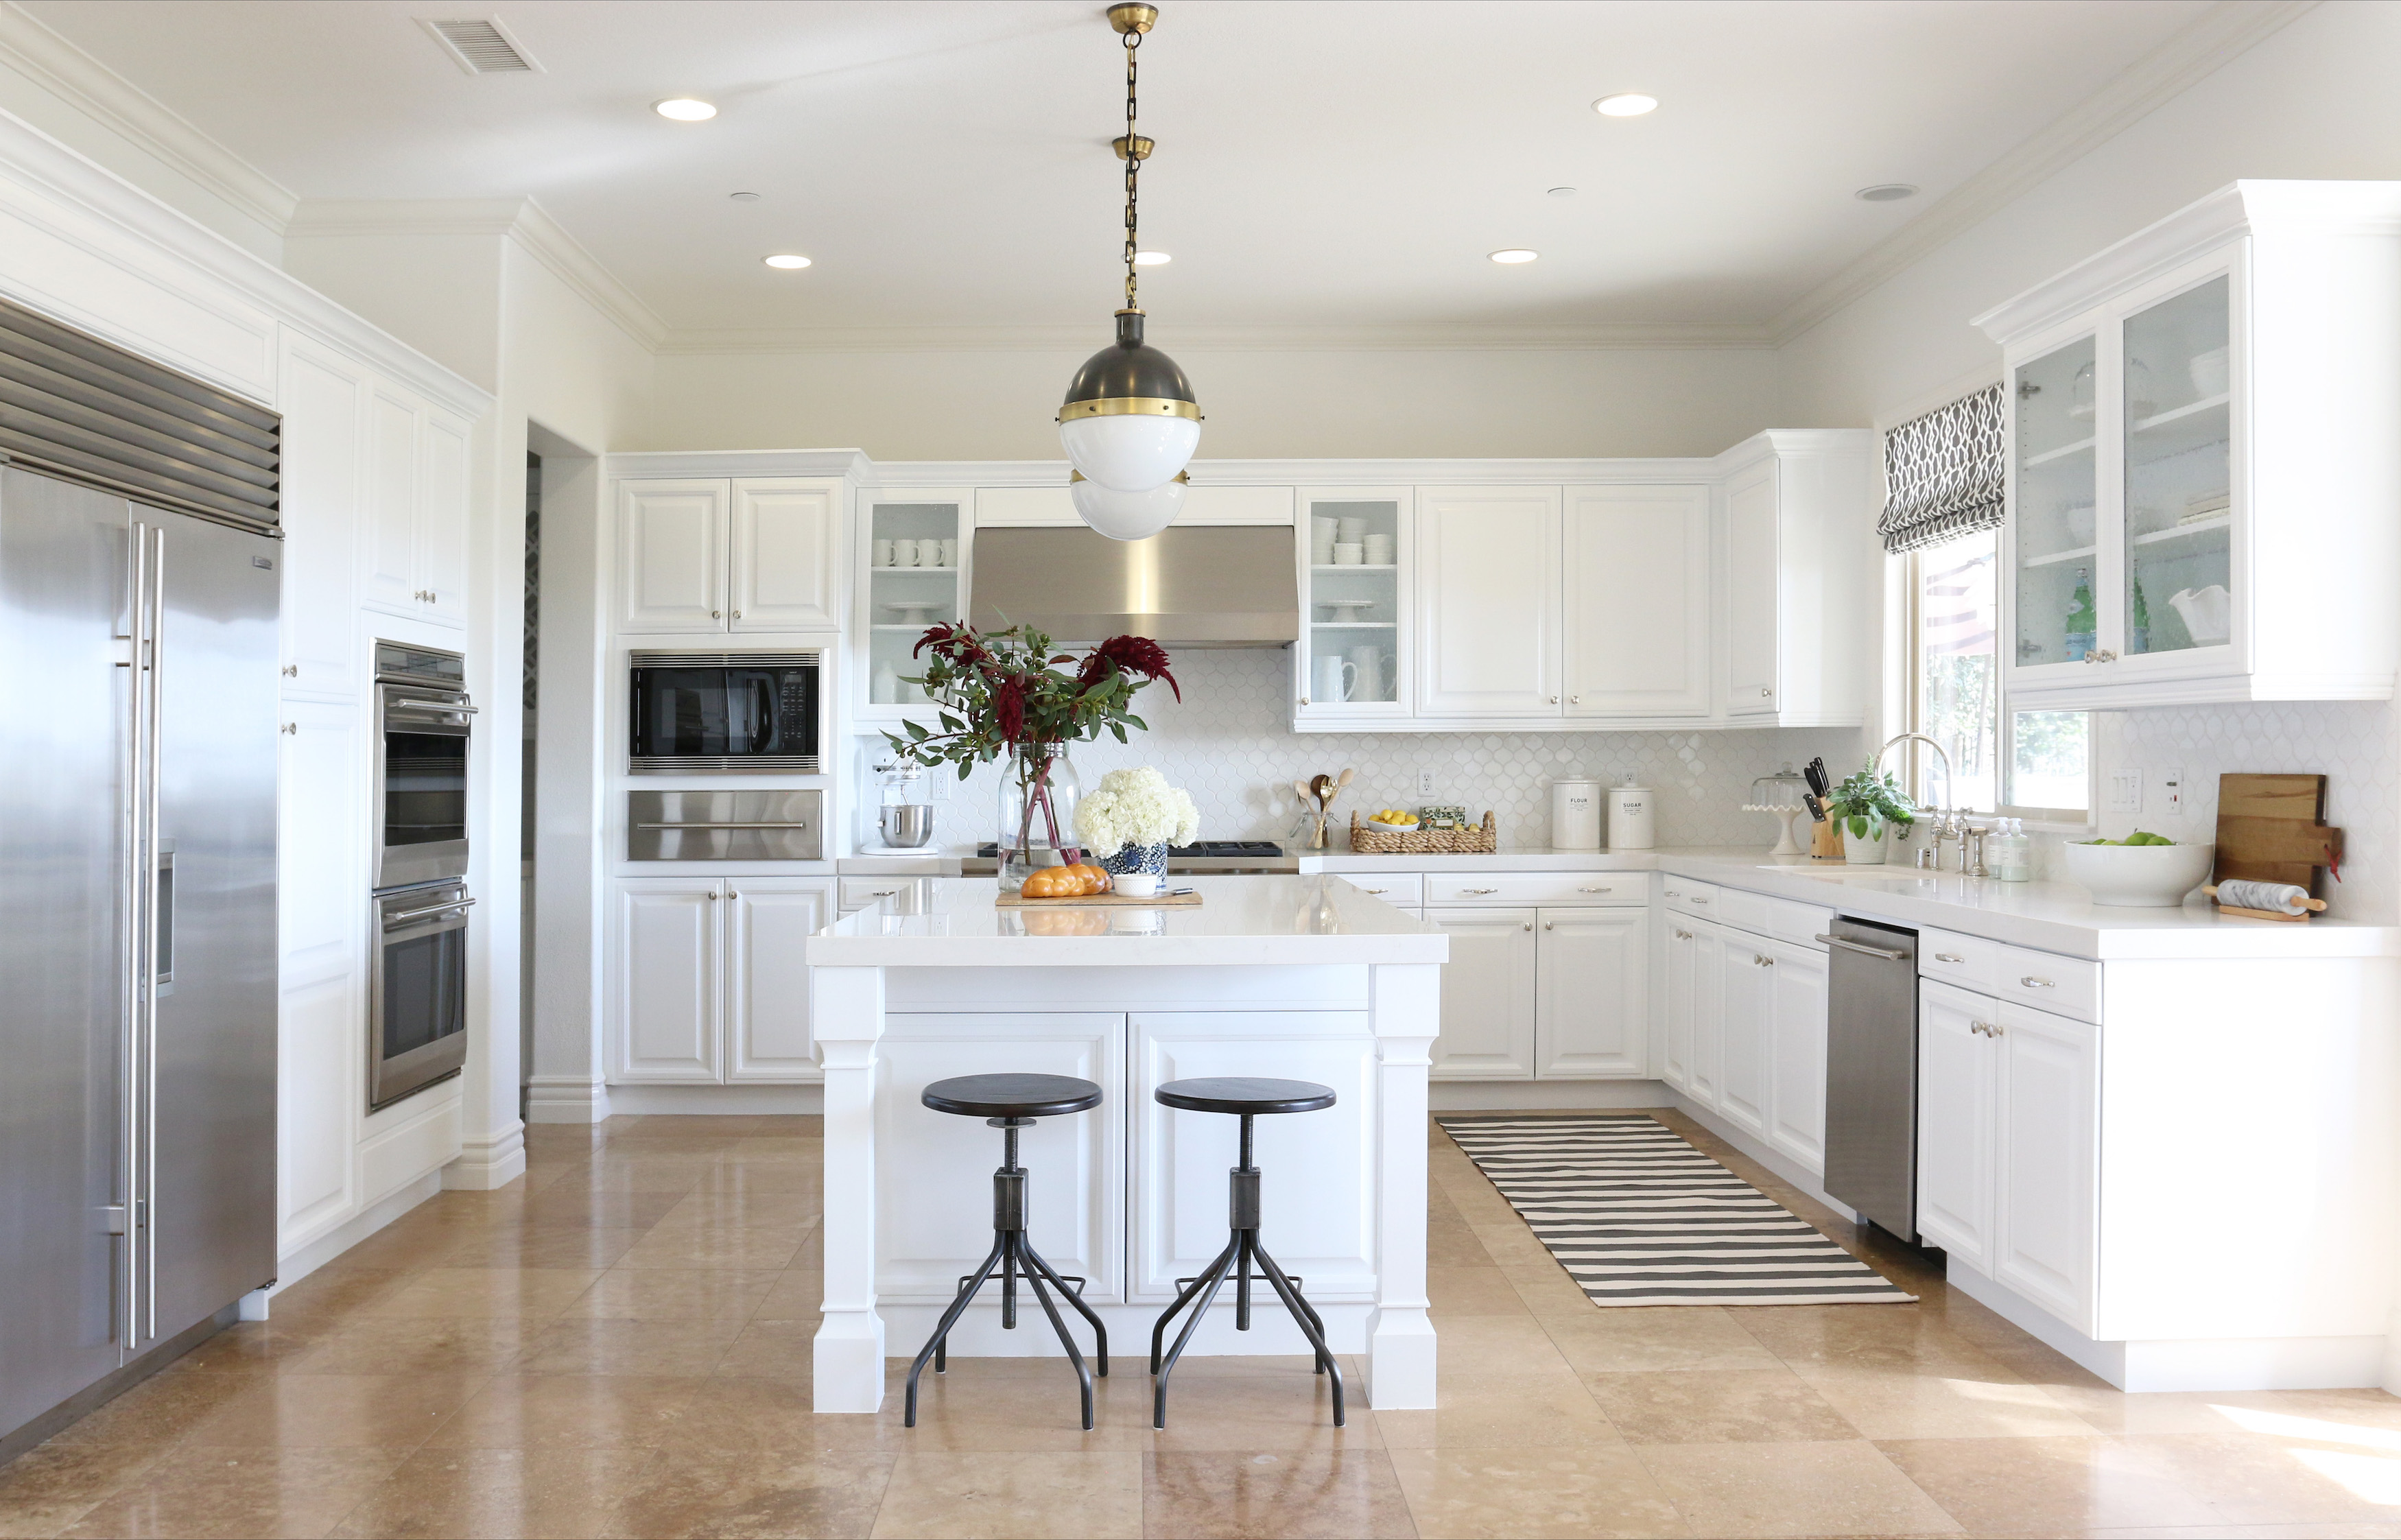 11 best white kitchen cabinets - design ideas for white cabinets AKGHQTX